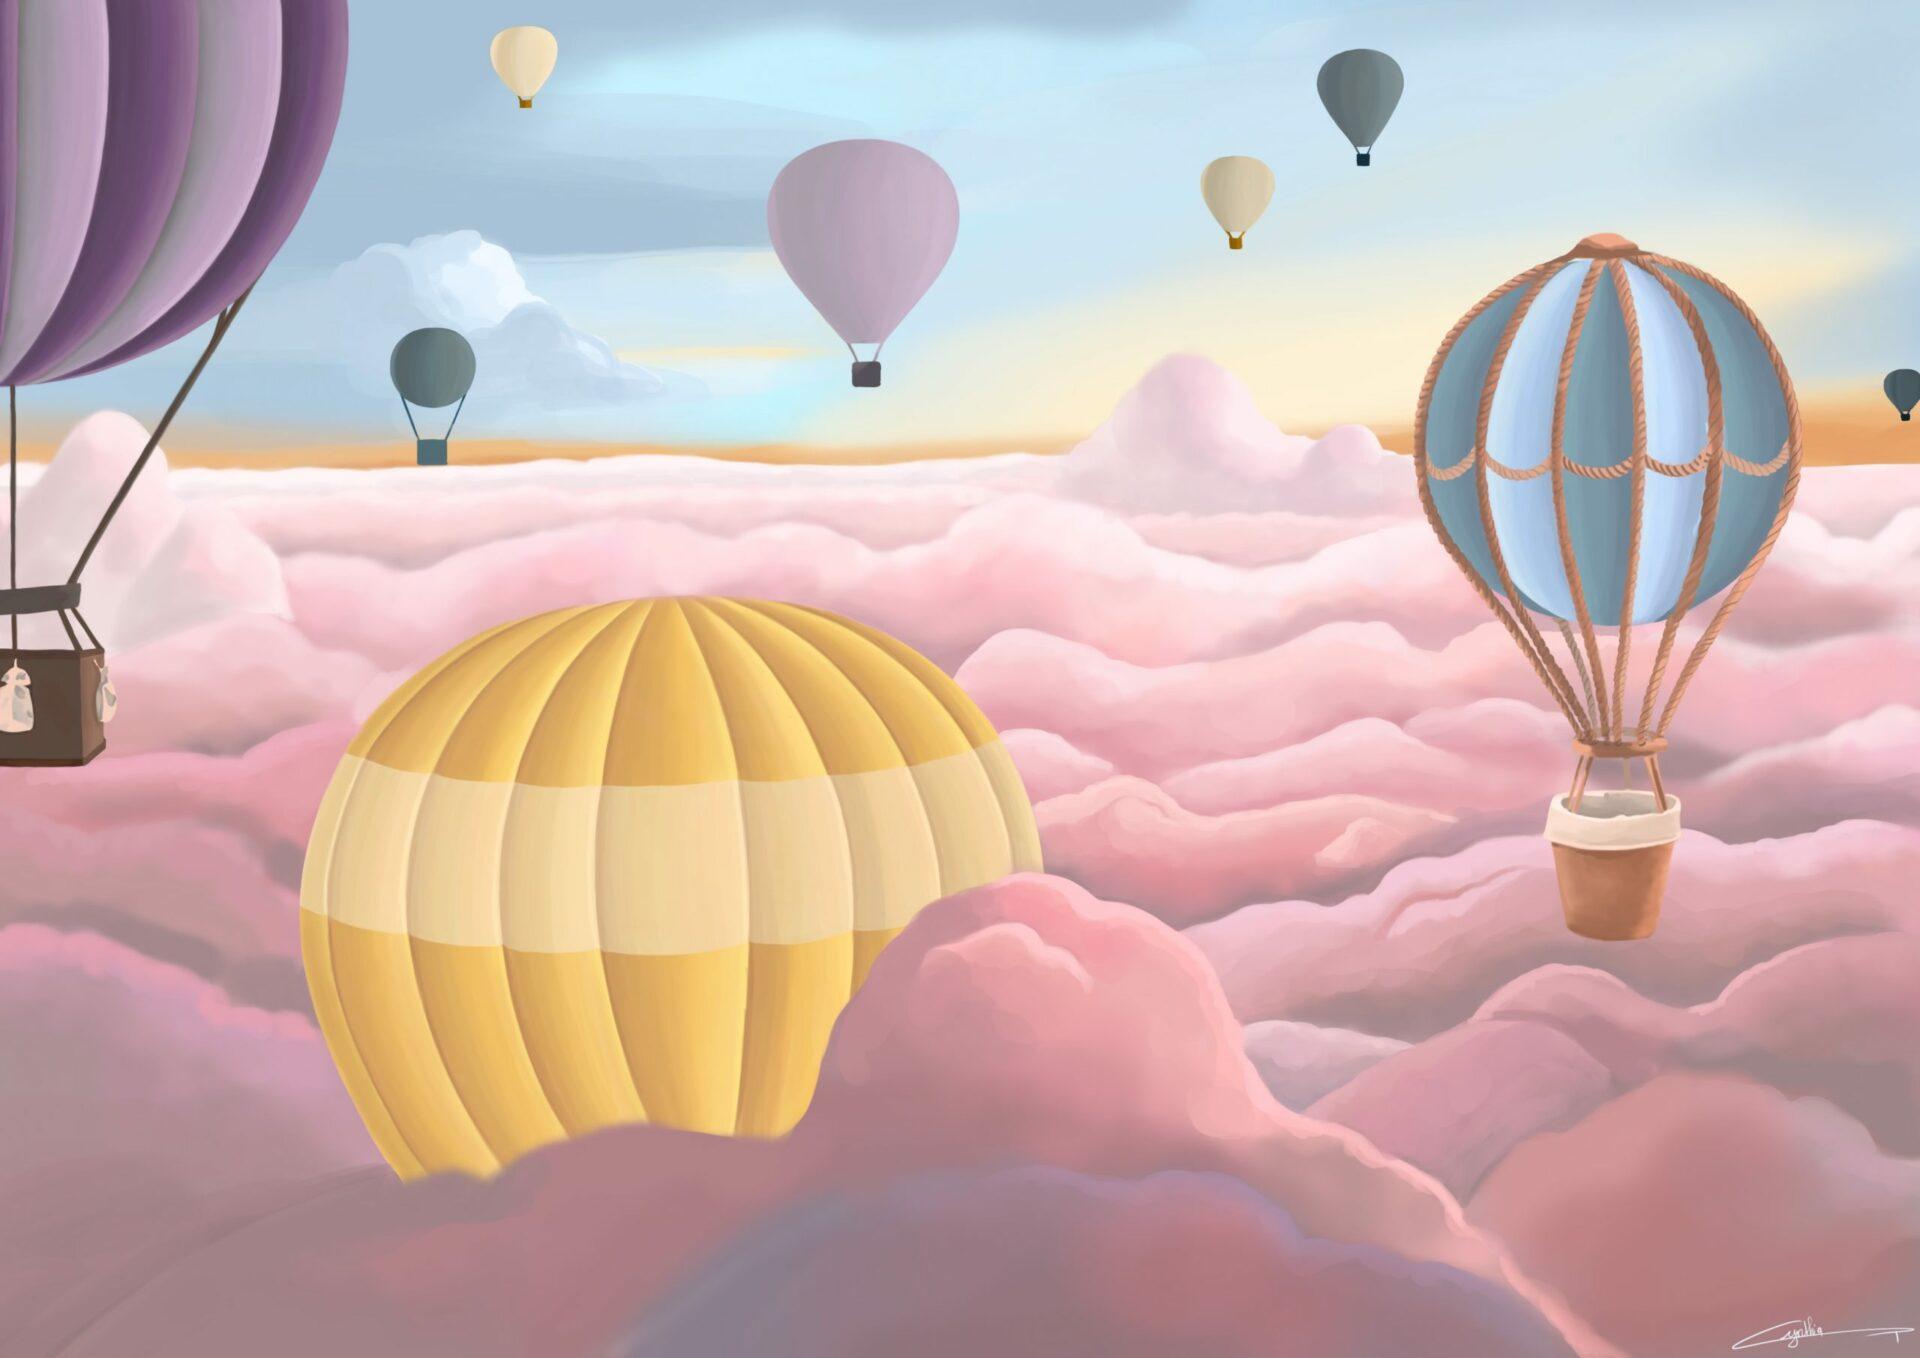 Cynthia Artstudio illustration illustratrice de l'imaginaire